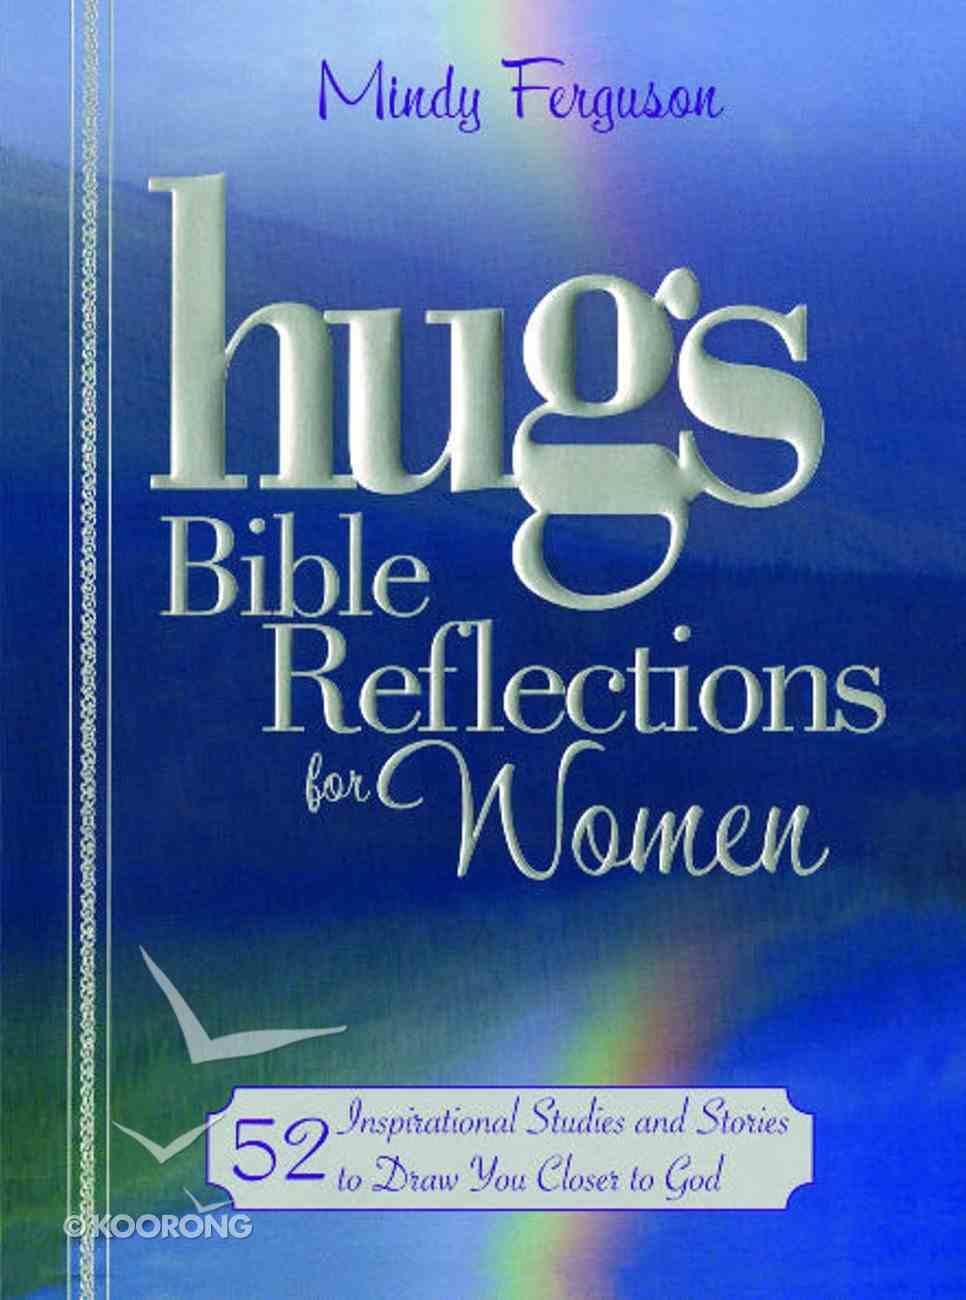 Hugs Bible Reflections For Women eBook